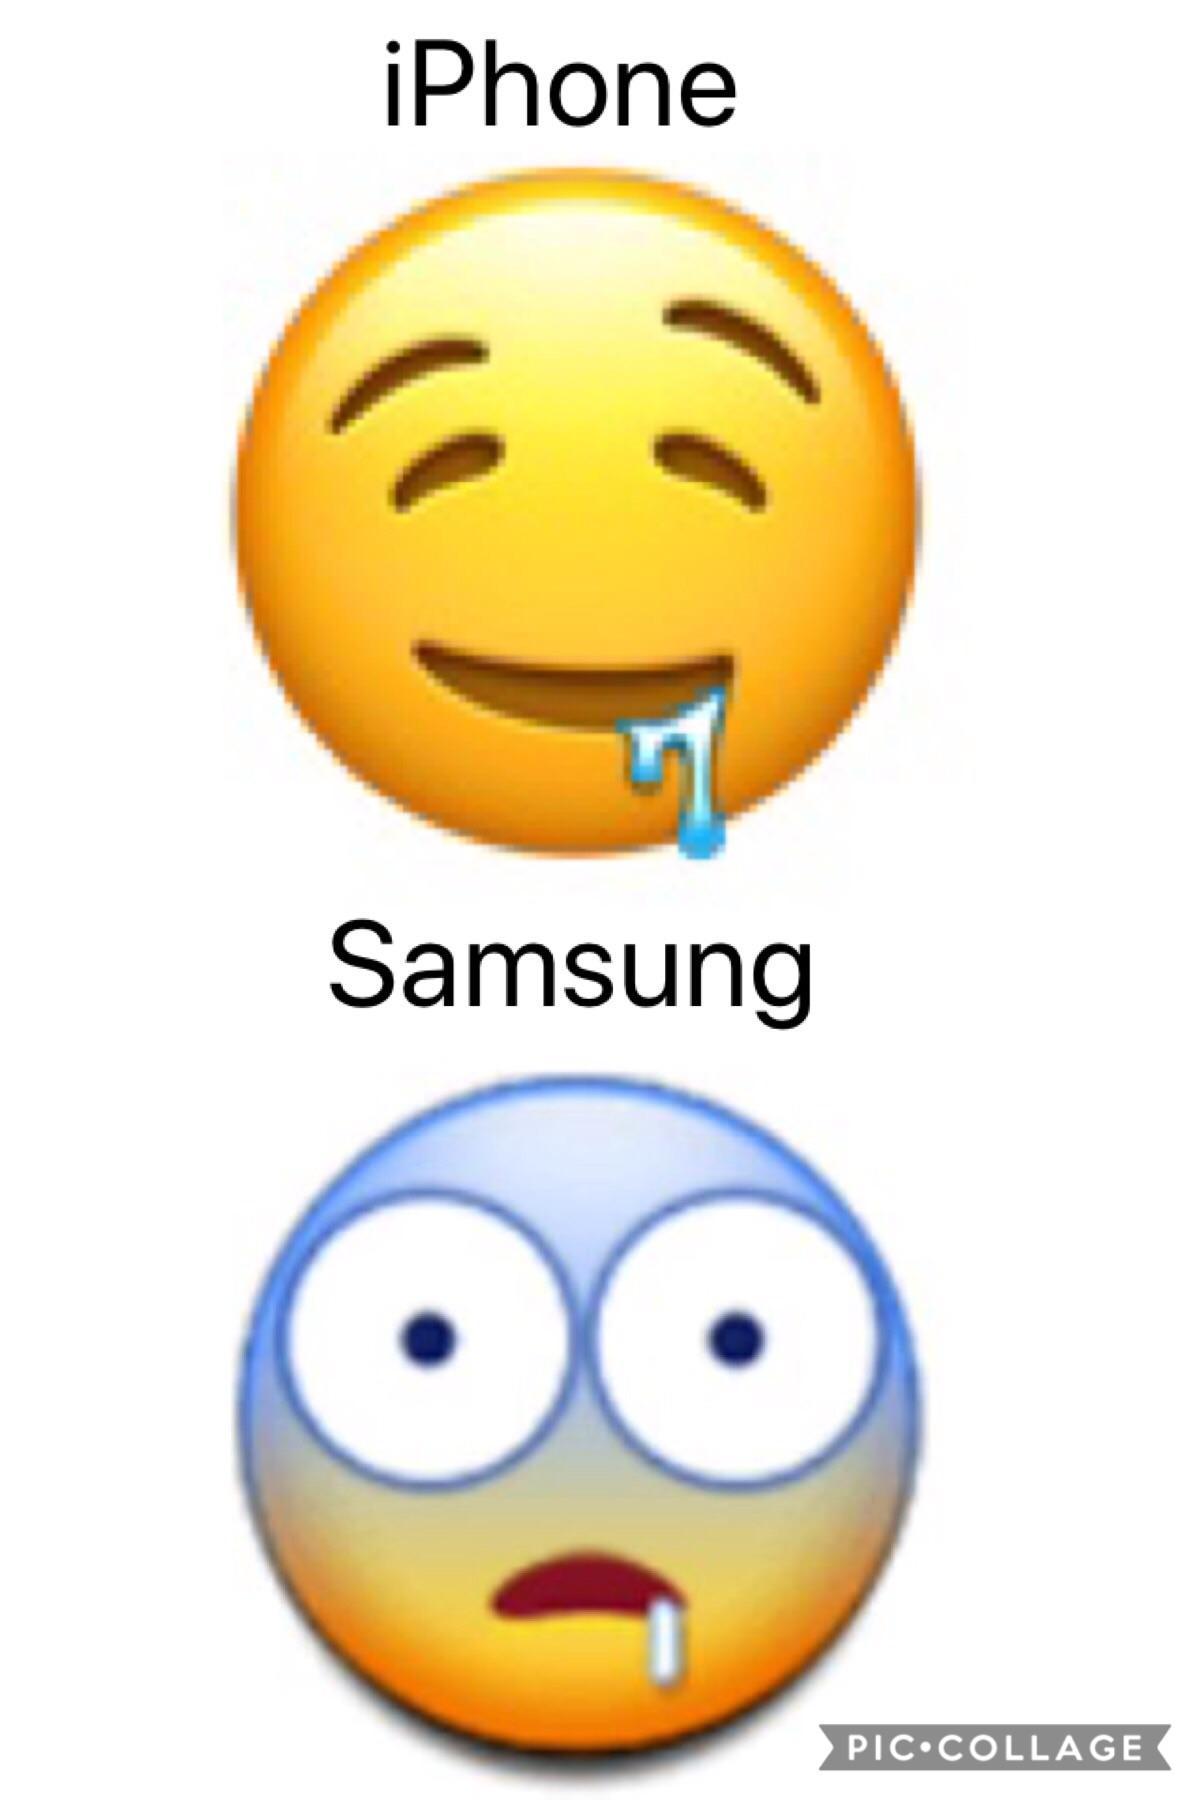 Eyeroll Emoticon : eyeroll, emoticon, Following, Yesterday's, Emoji,, Here's, Mother, Sending, Mouth-watering, Emoji, Inappropriately, CrappyDesign